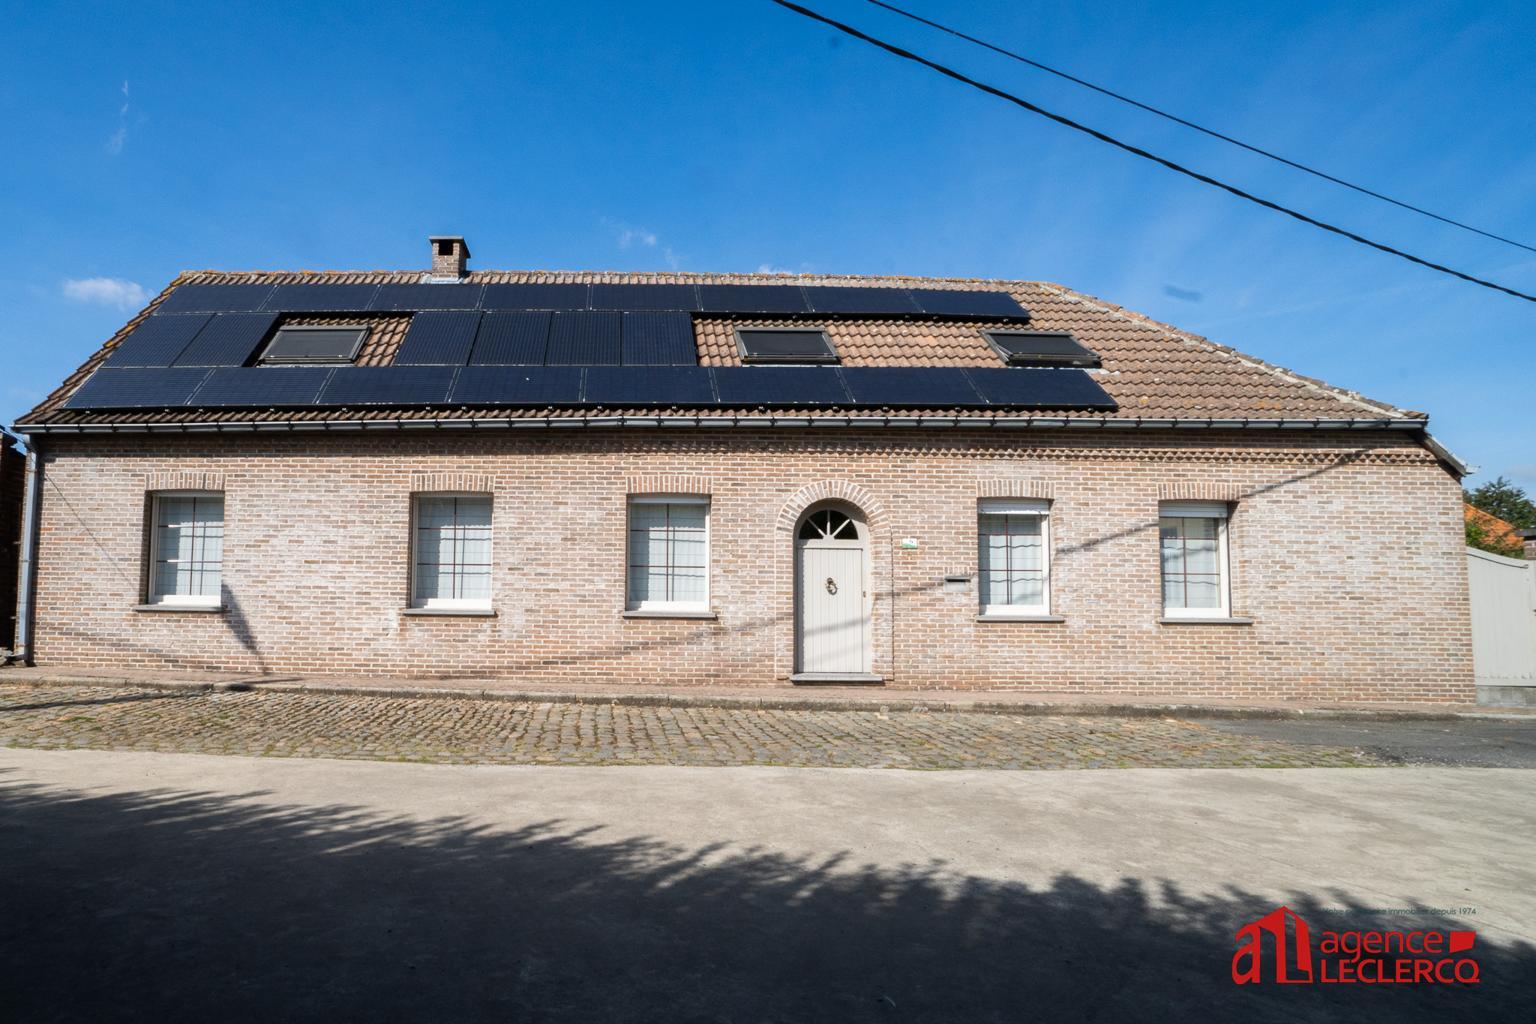 Maison - Tournai Ramegnies-Chin - #4517289-0